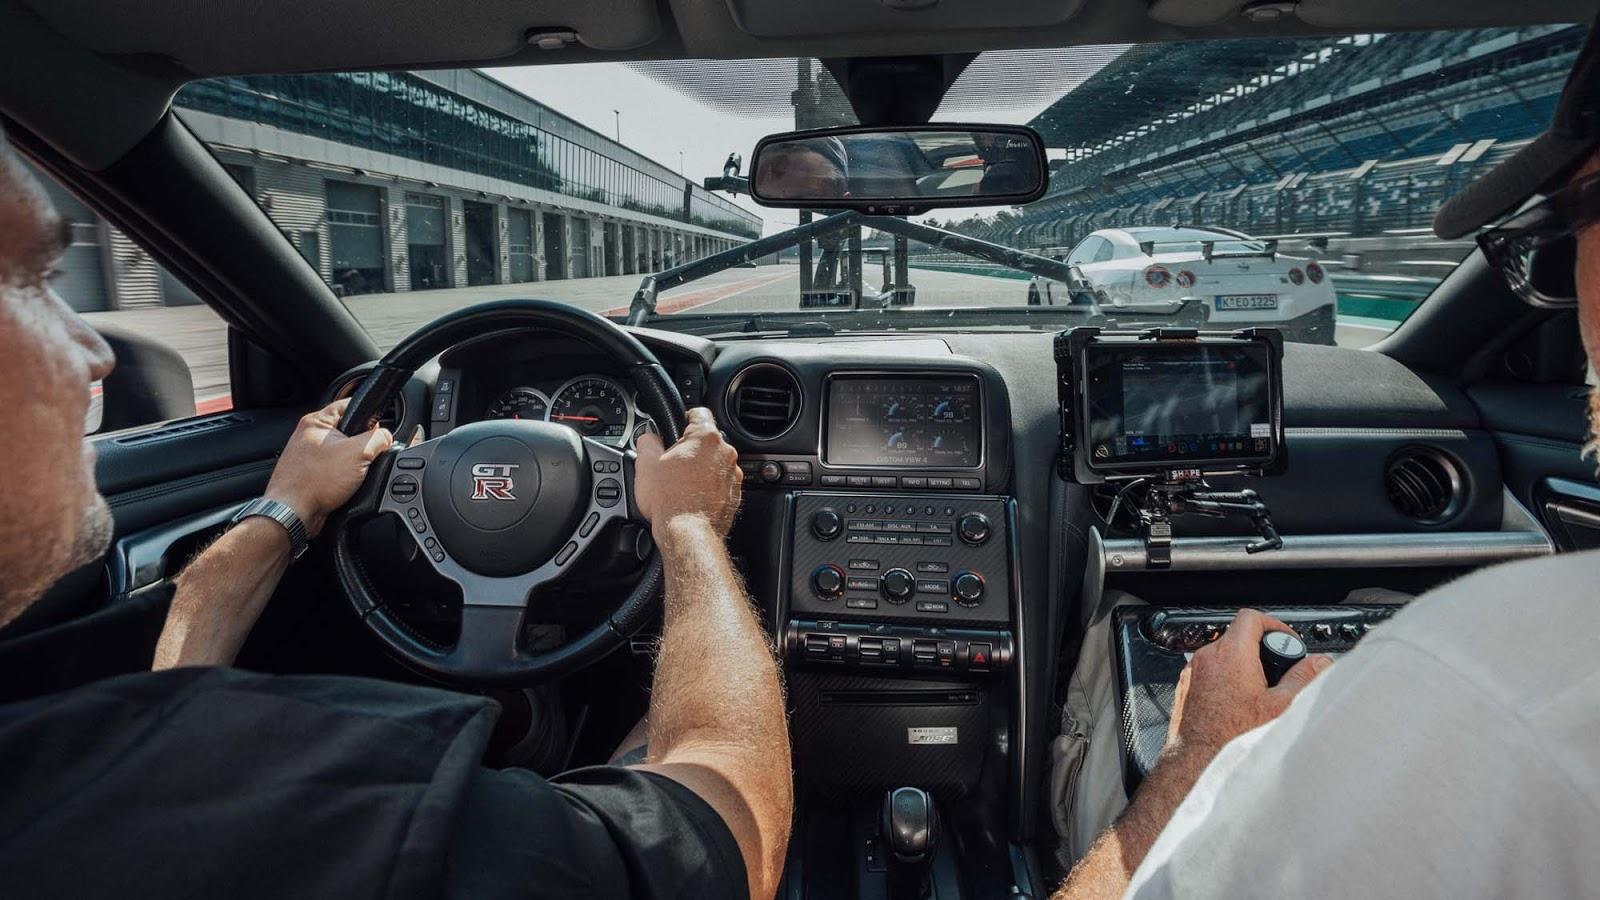 GT R NISMO Berlin Test Drive 12 Πώς μπορείς να κινηματογραφήσεις τον Godzilla Godzilla, GTR, Nismo, Nismo GT-R, Nissan, Nissan GT-R NISMO, video, videos, zblog, ΦΩΤΟ, φωτογραφίες